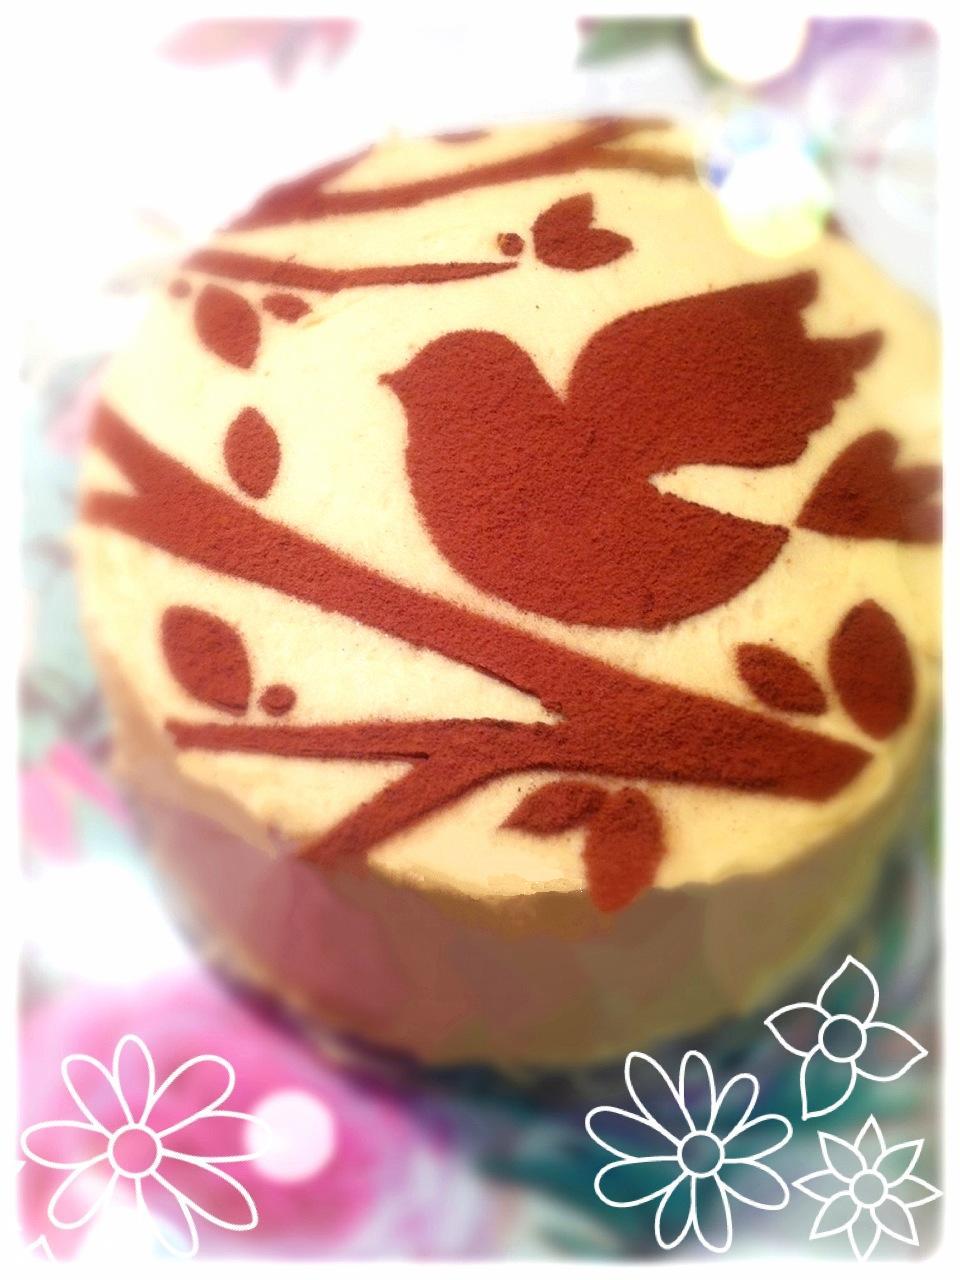 Coffee and Walnut Birthday Cake London Cherie Kelly